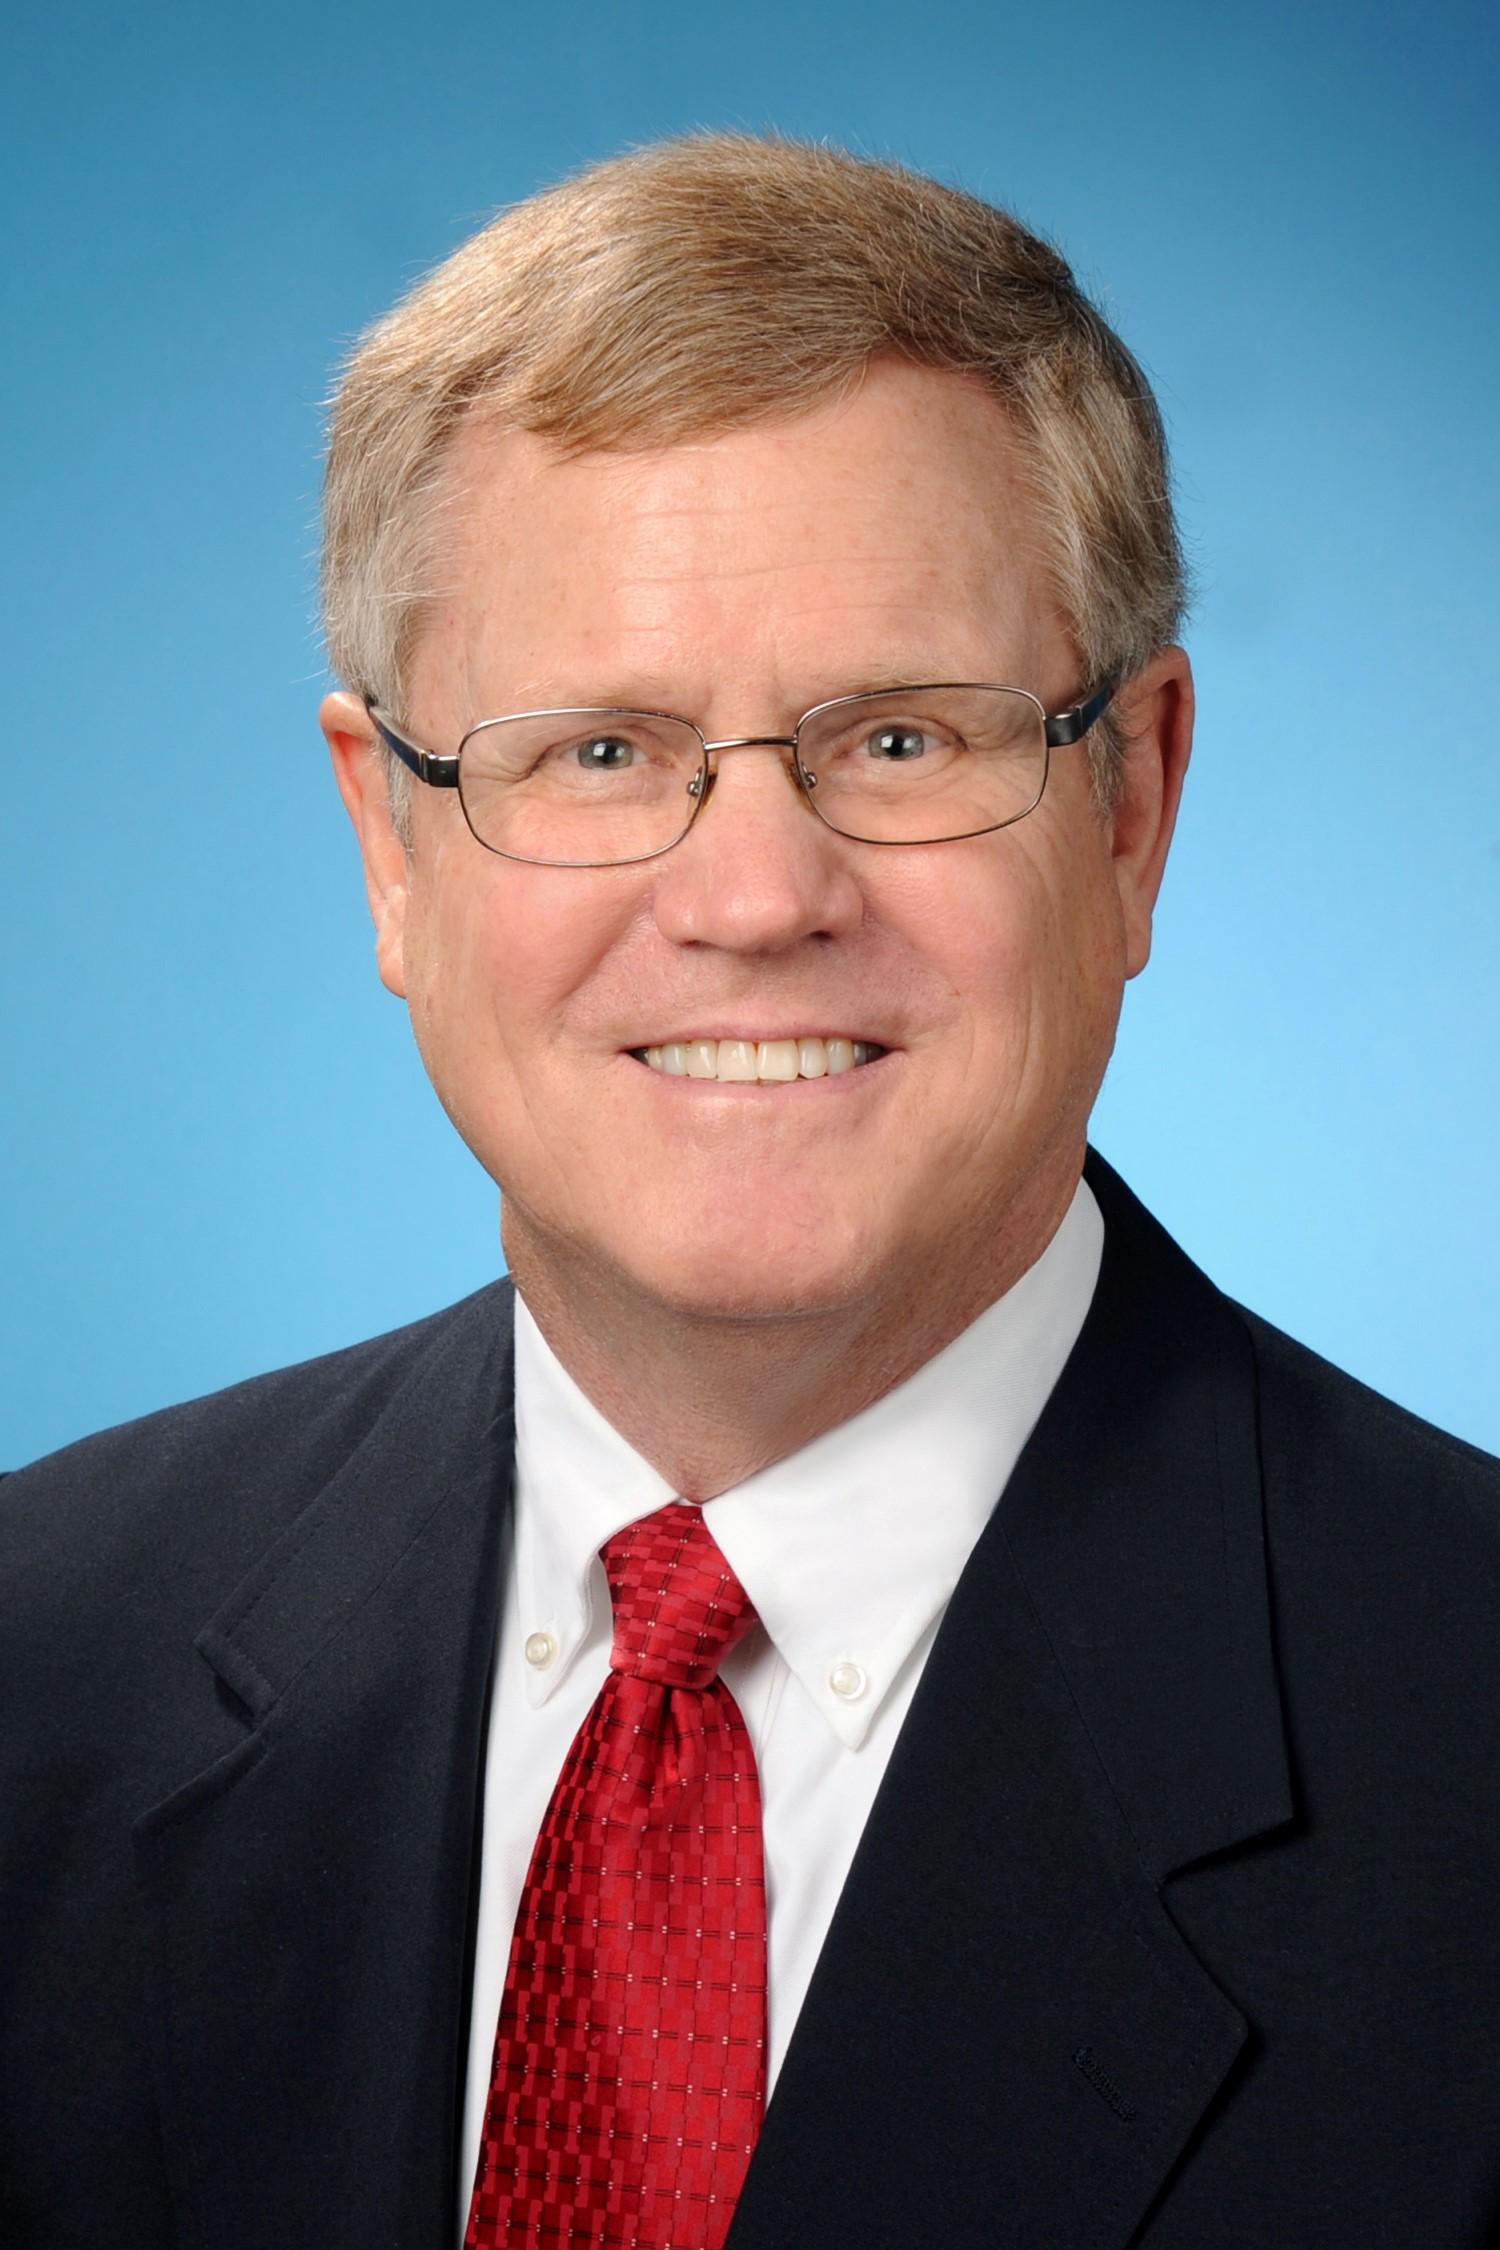 Gregg Pluemer